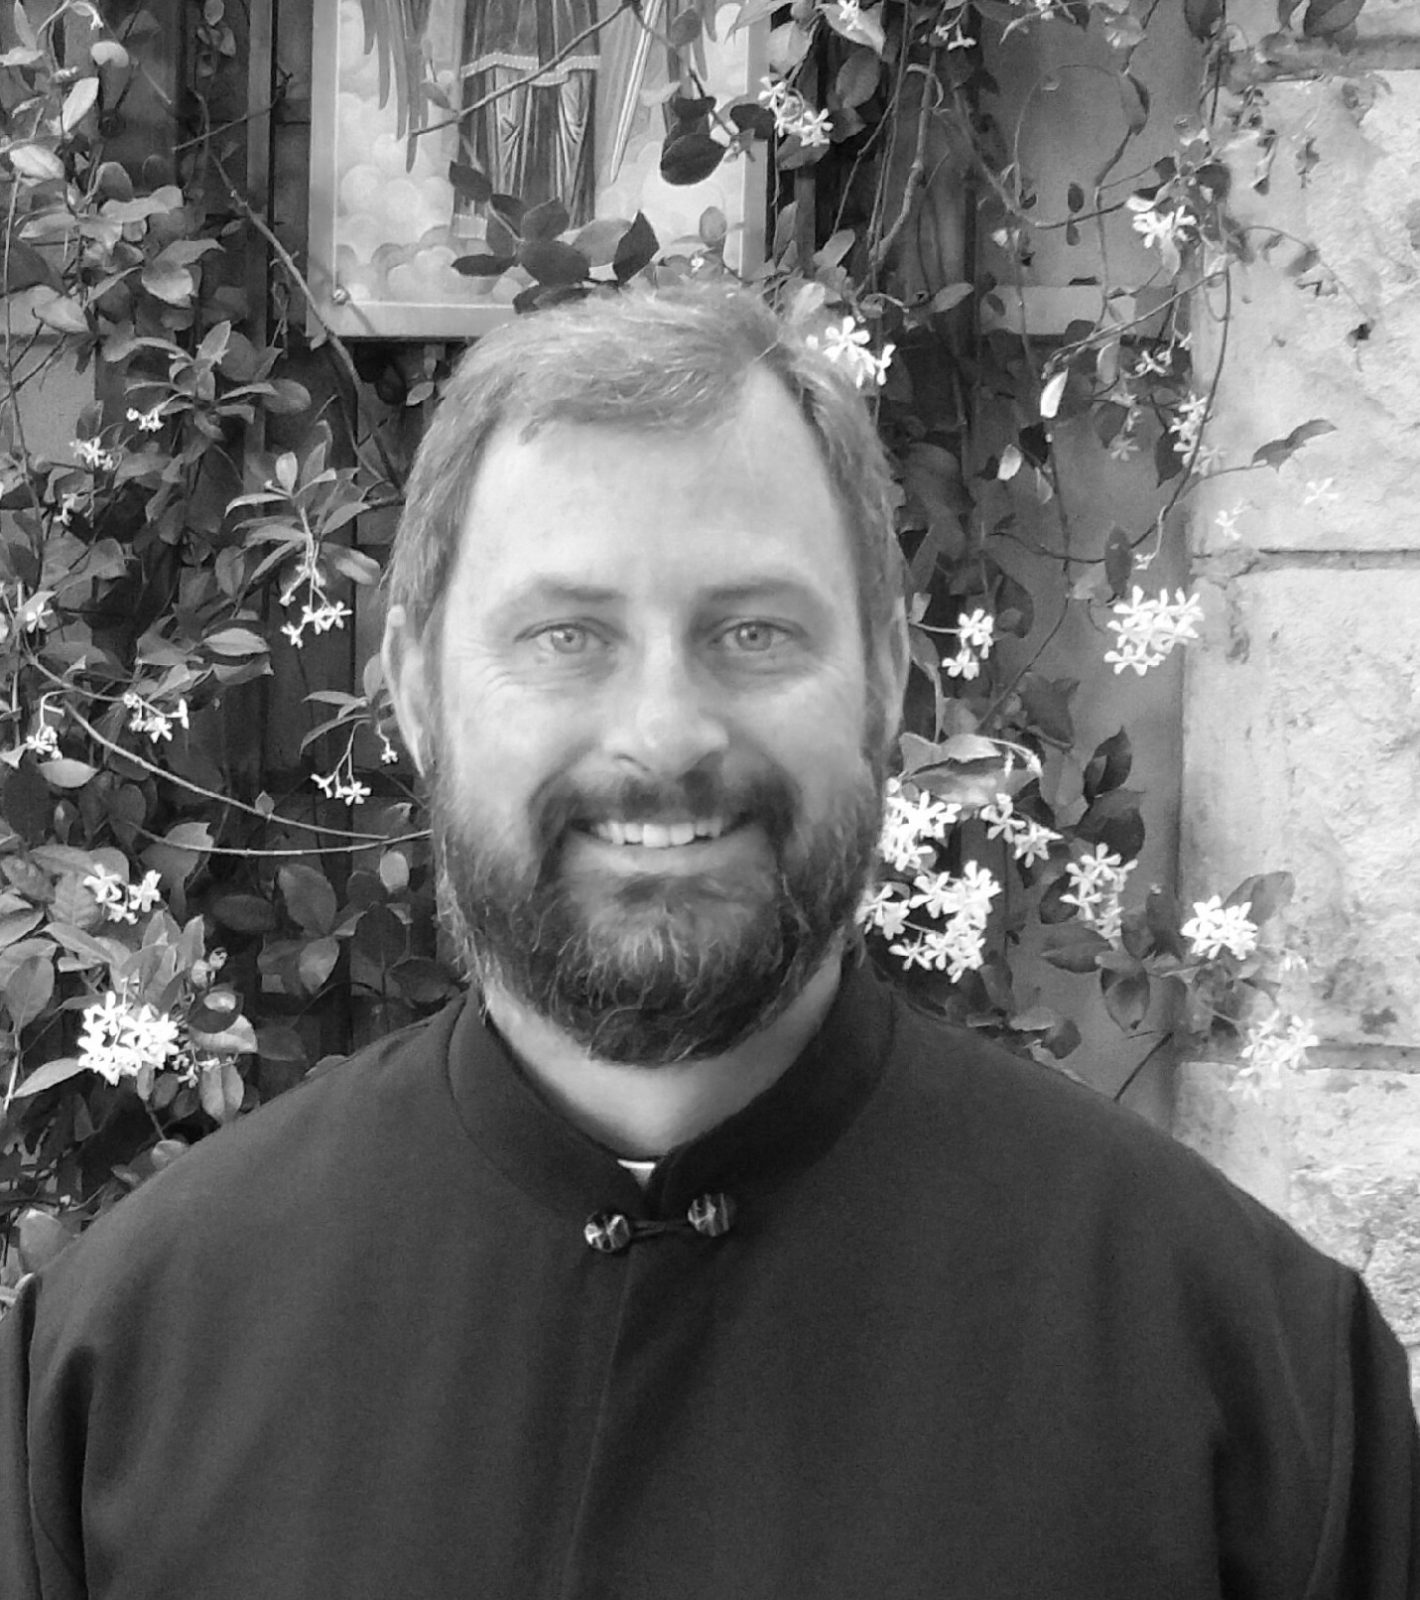 Online Christian Homeschool educator